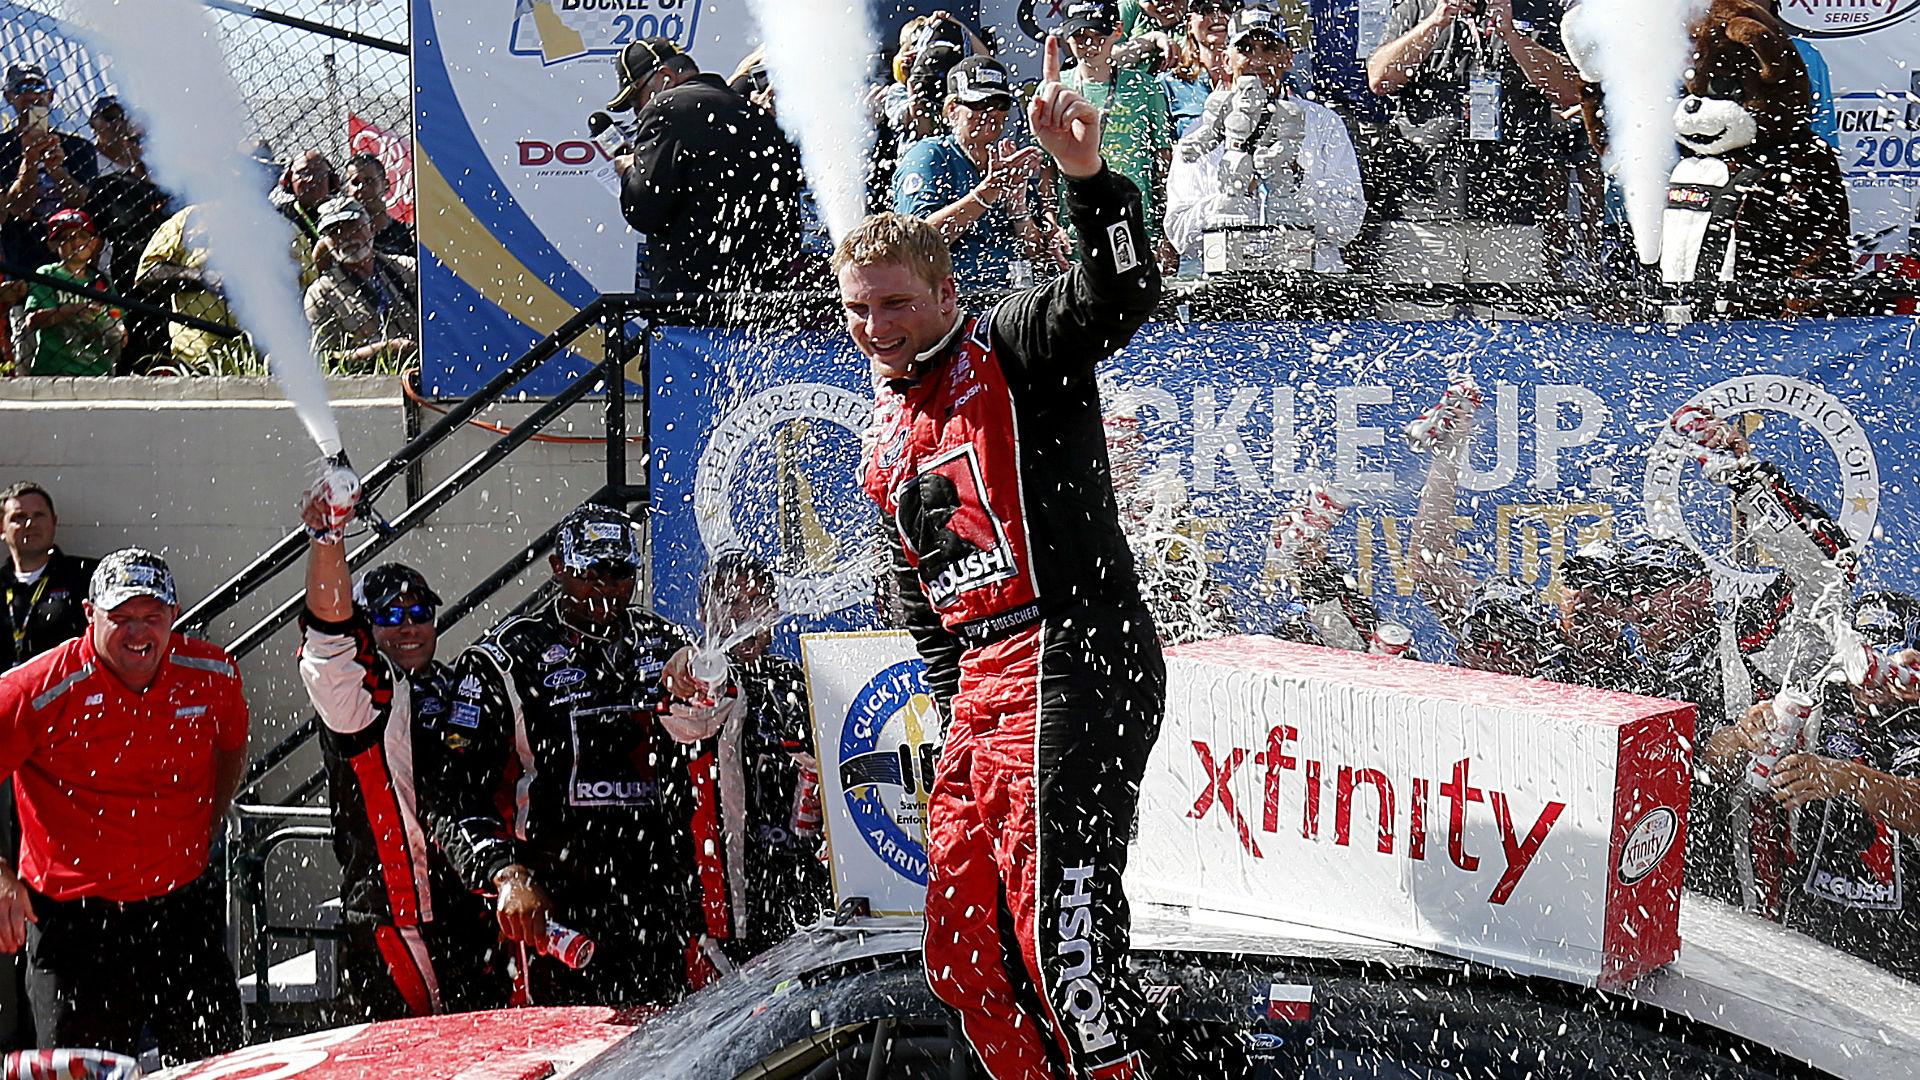 Xfinity Series Dover results: Chris Buescher wins; teammate upset